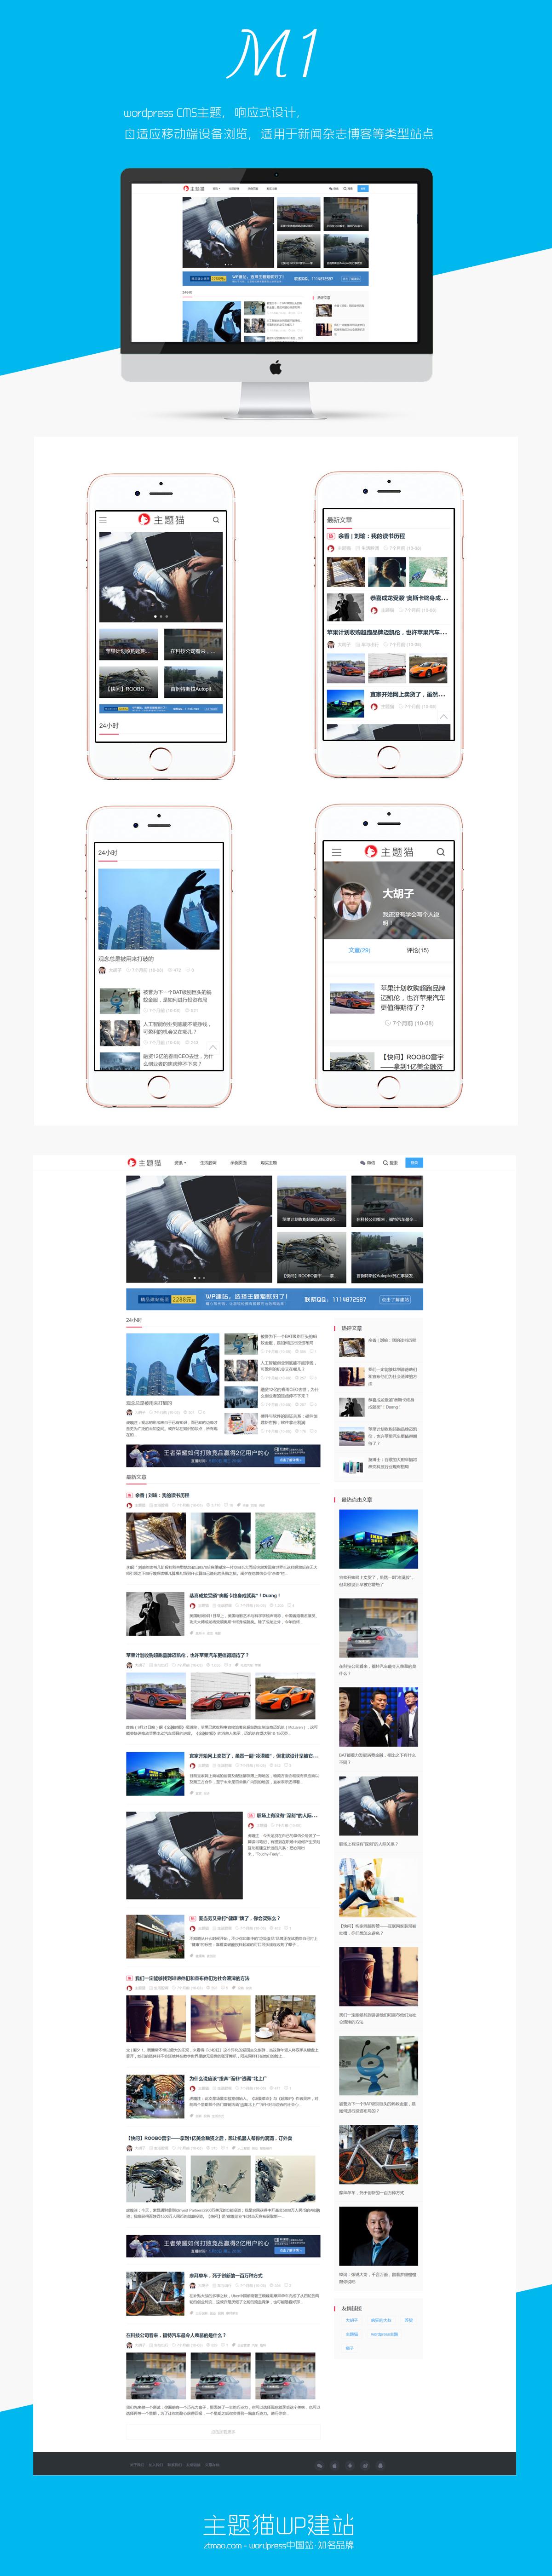 M1虎嗅网主题~V2.4.9—仿虎嗅网wordpress模板,新闻网站模板,cms模板,虎嗅网wordpress主题-M1